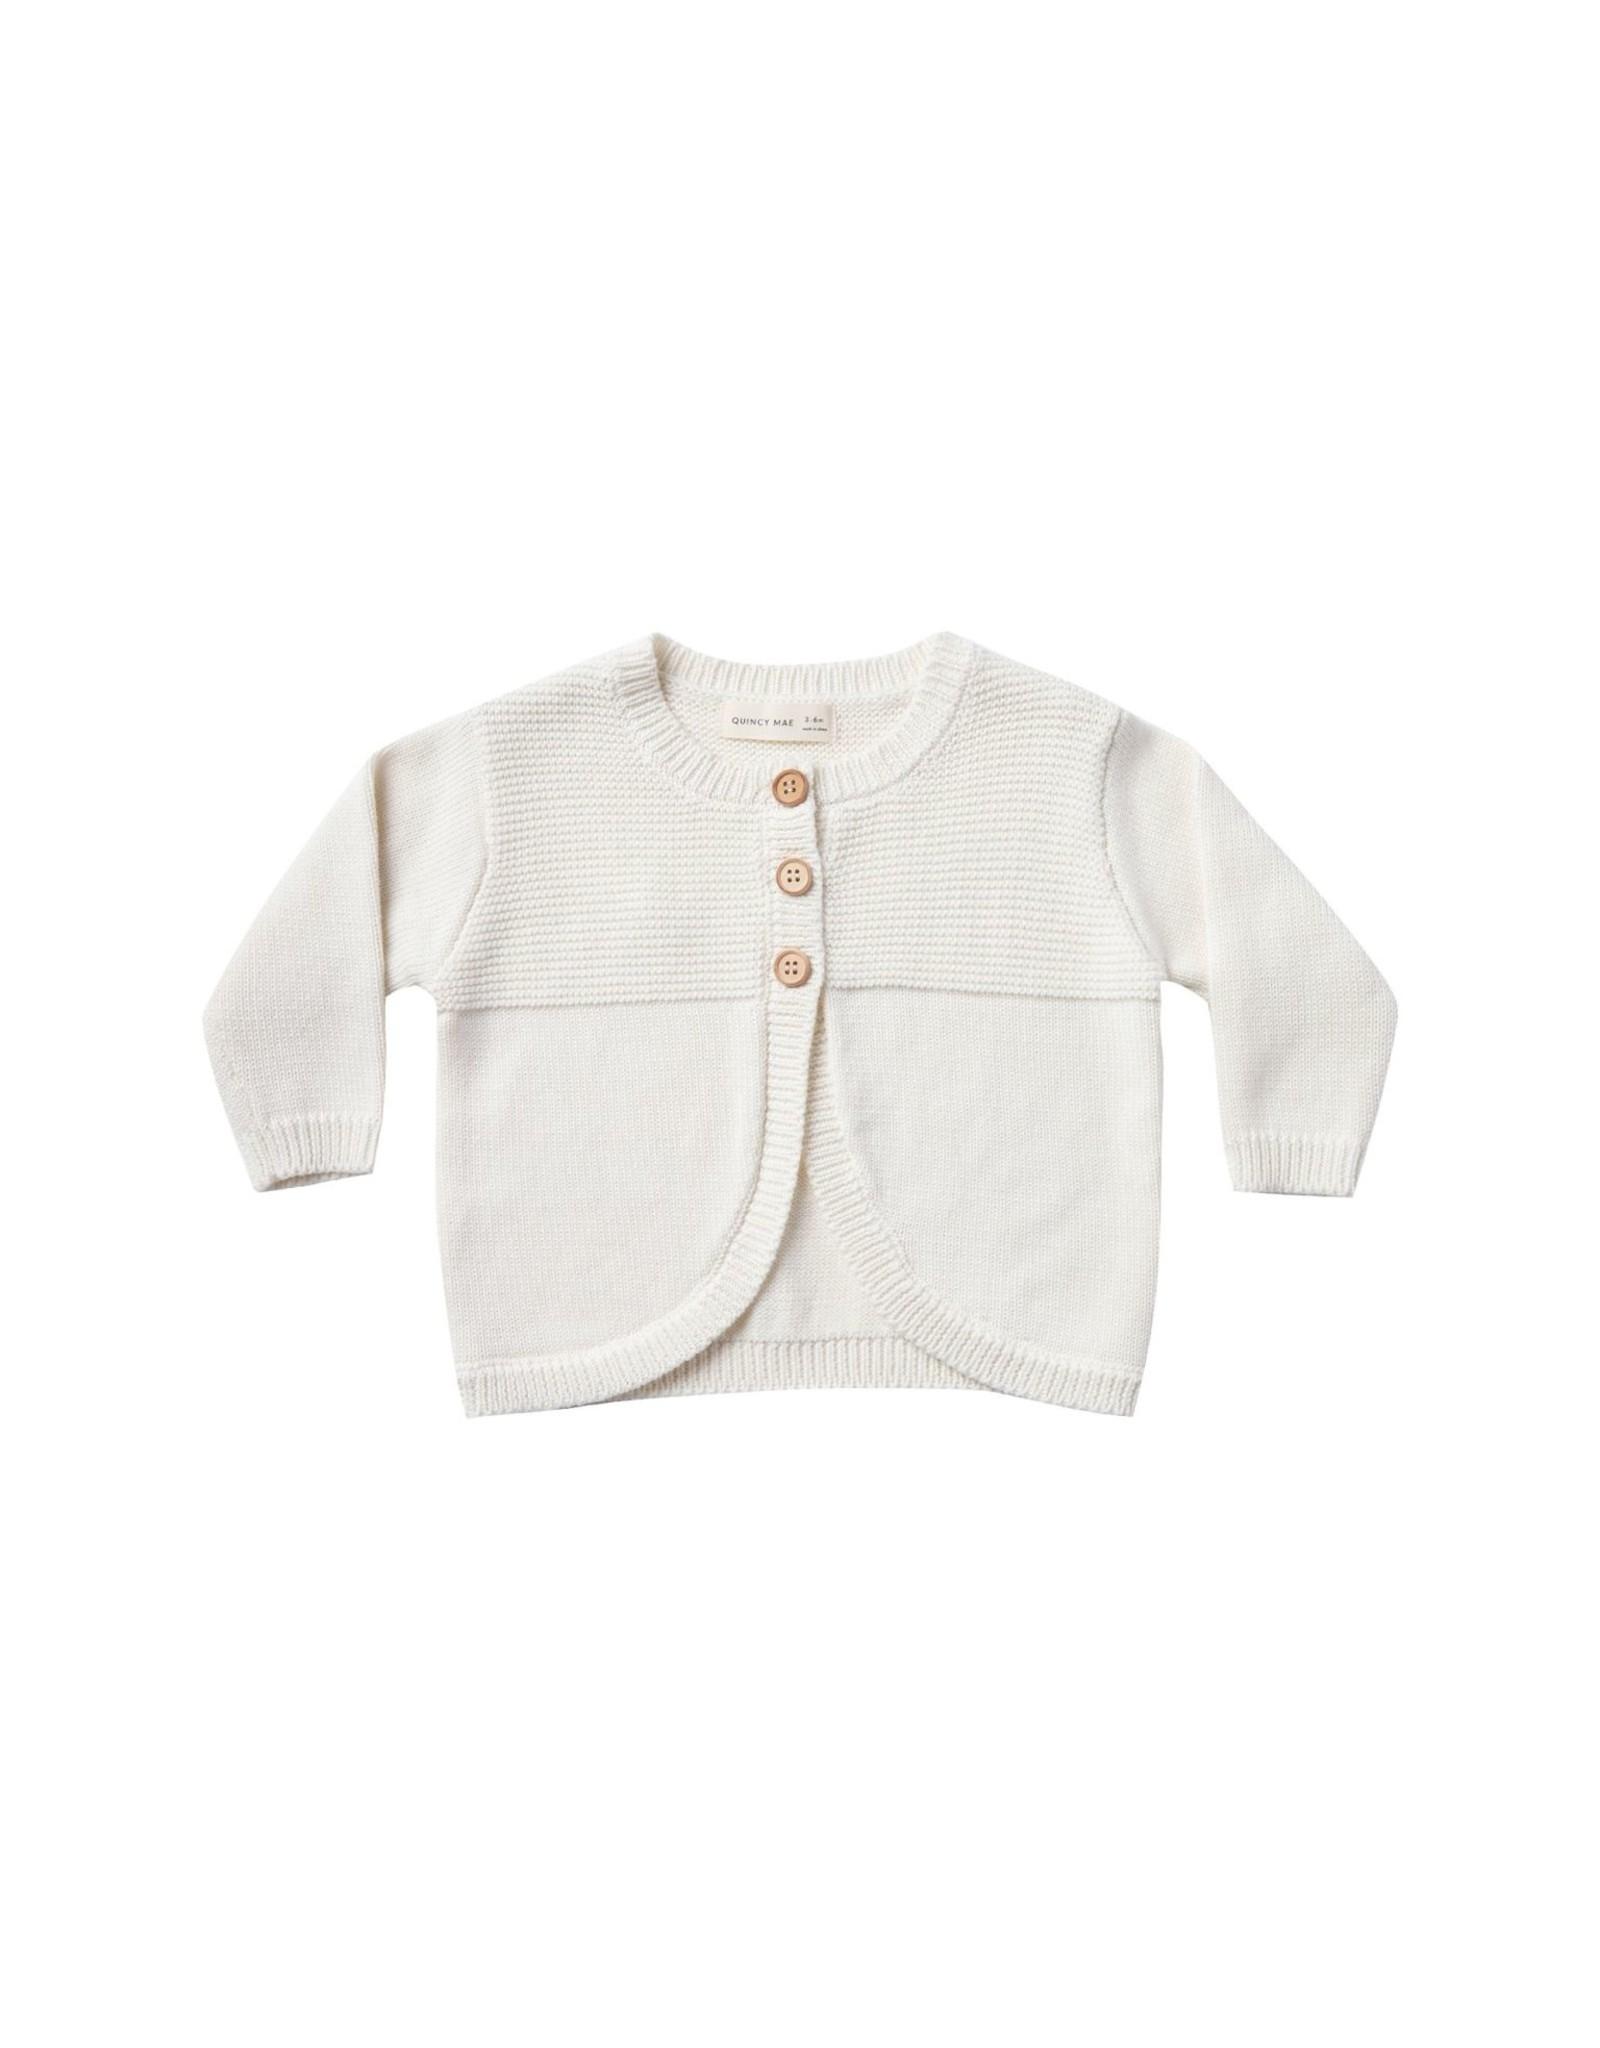 Quincy Mae knit cardigan- ivory